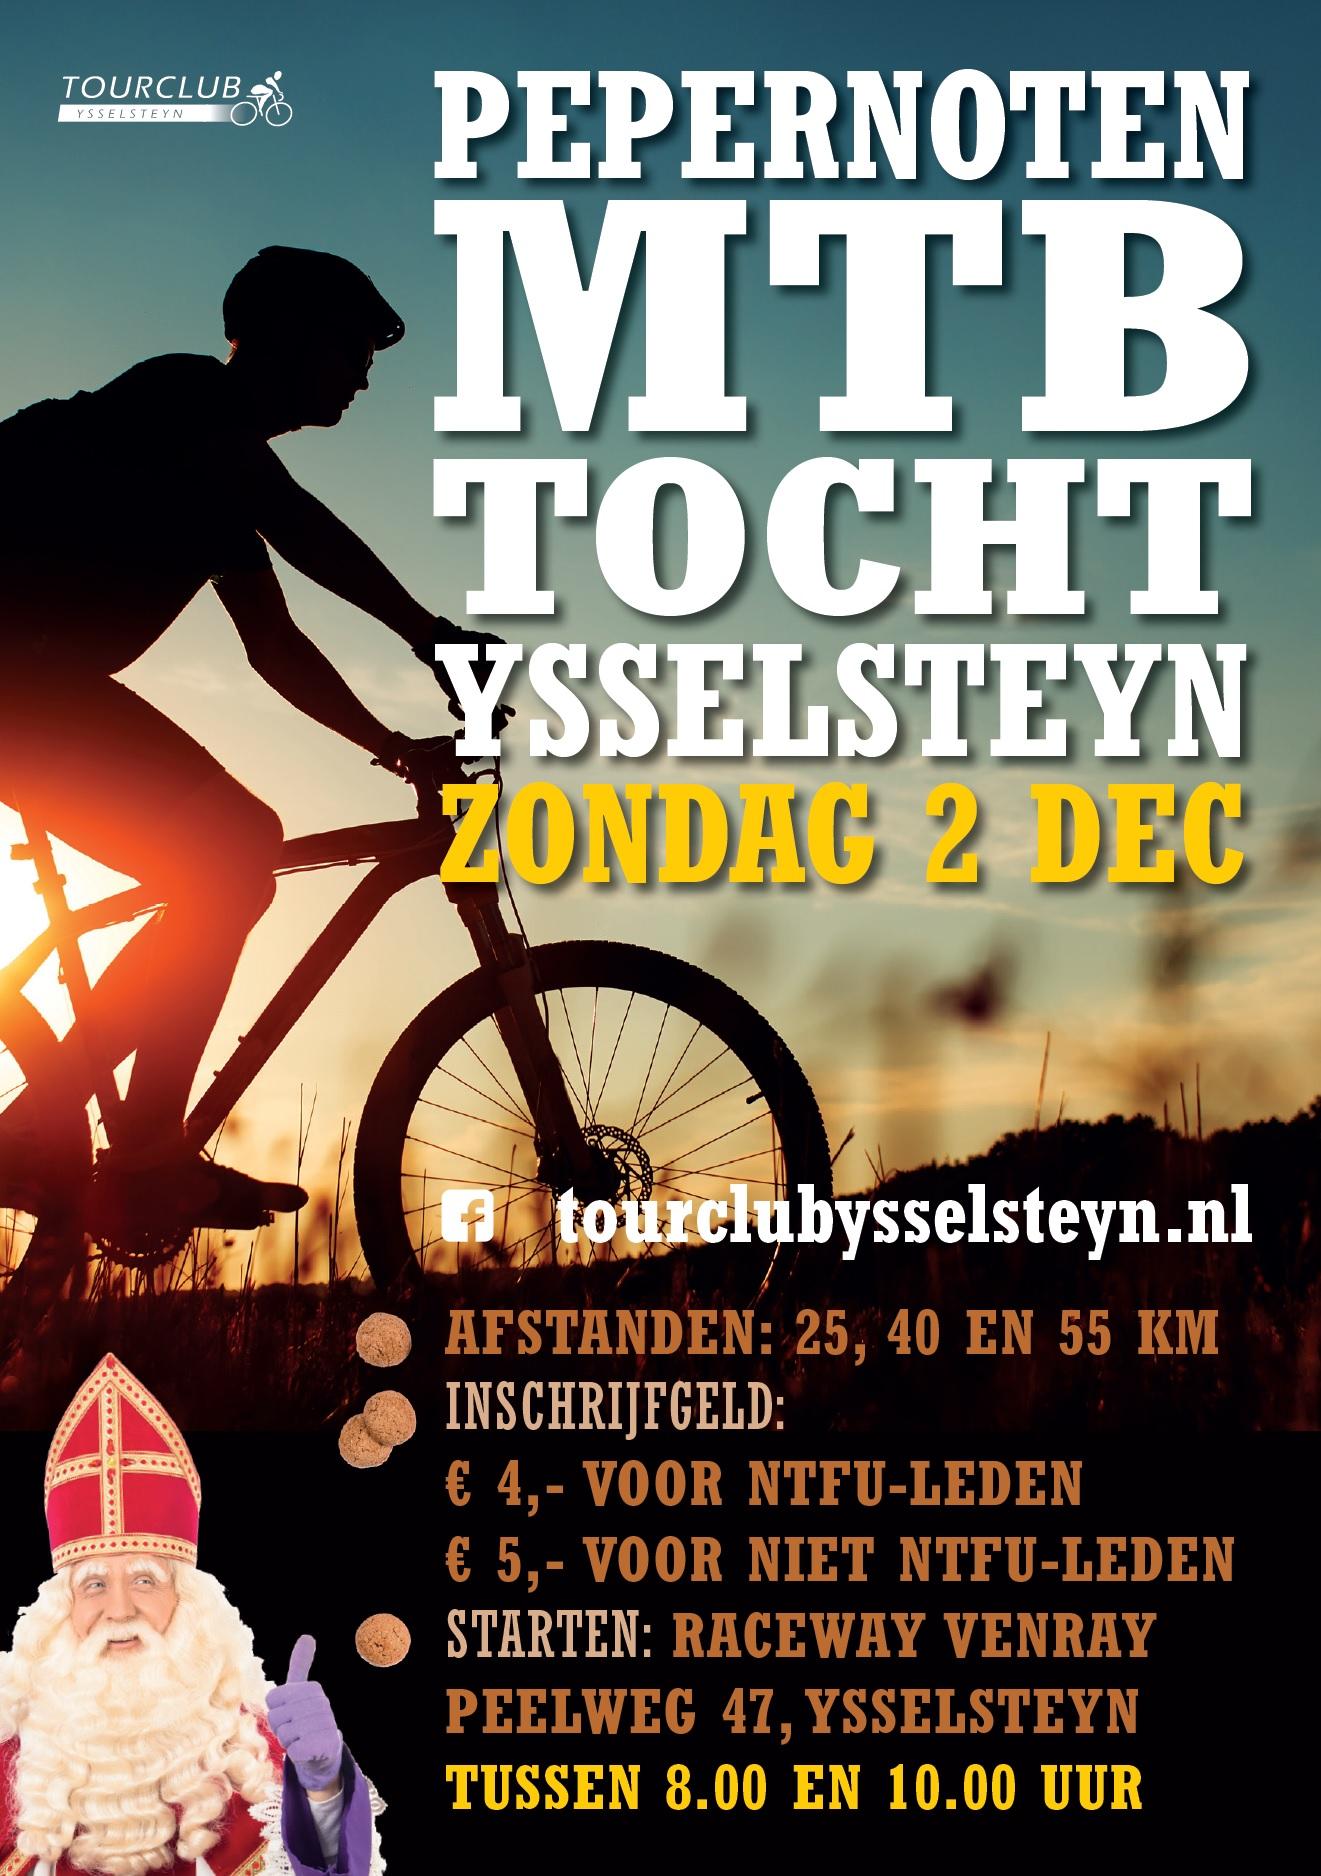 http://www.tourclubysselsteyn.nl/images/pepernotentocht_definitief.jpg